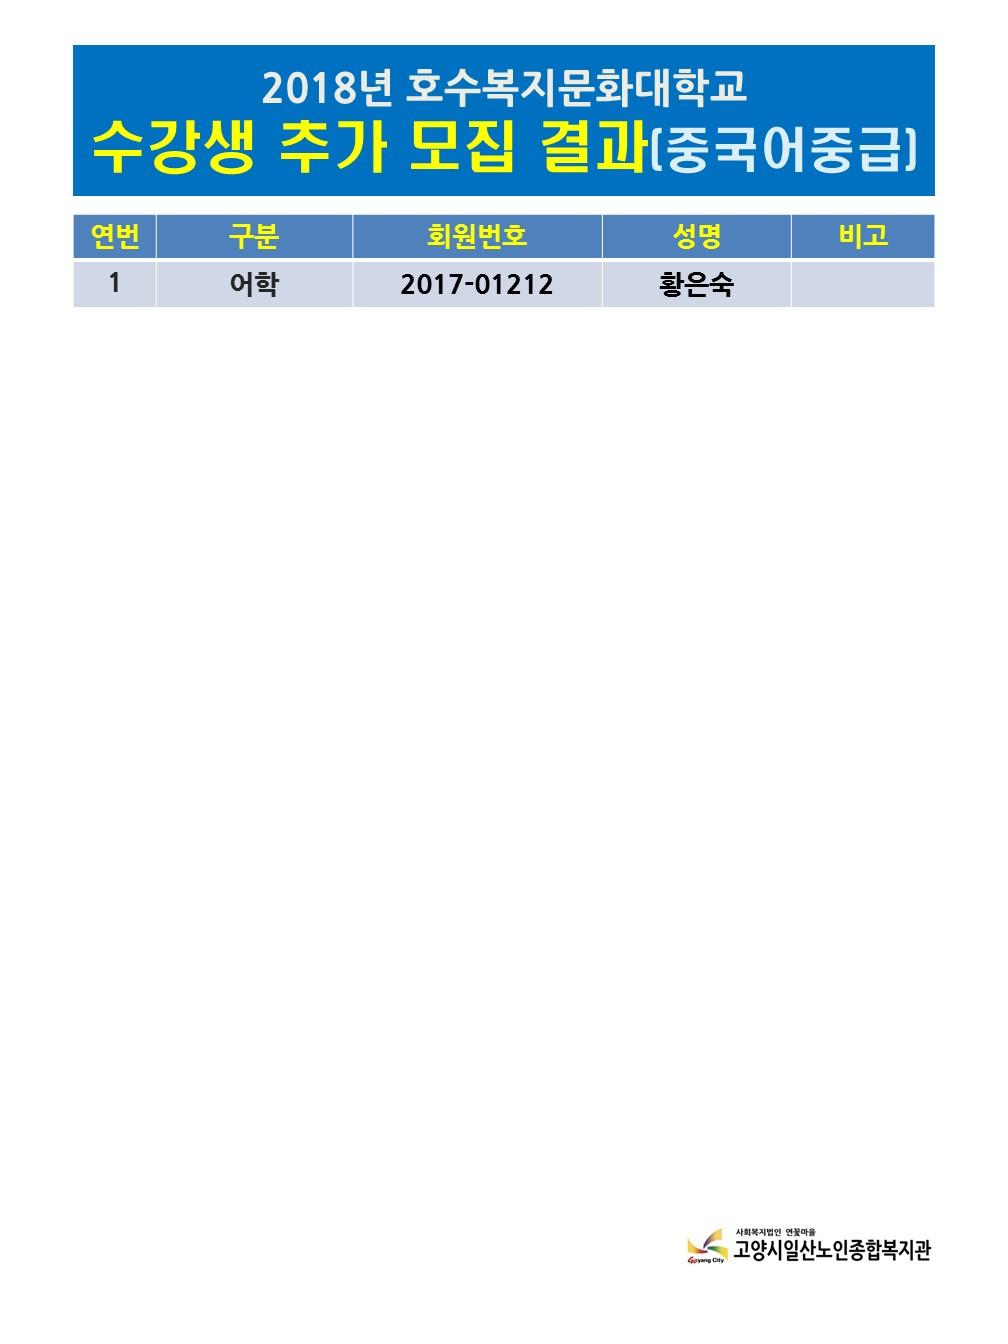 ffcb03e868cd9d87a02a4afb17f56e40_1529539410_1319.JPG